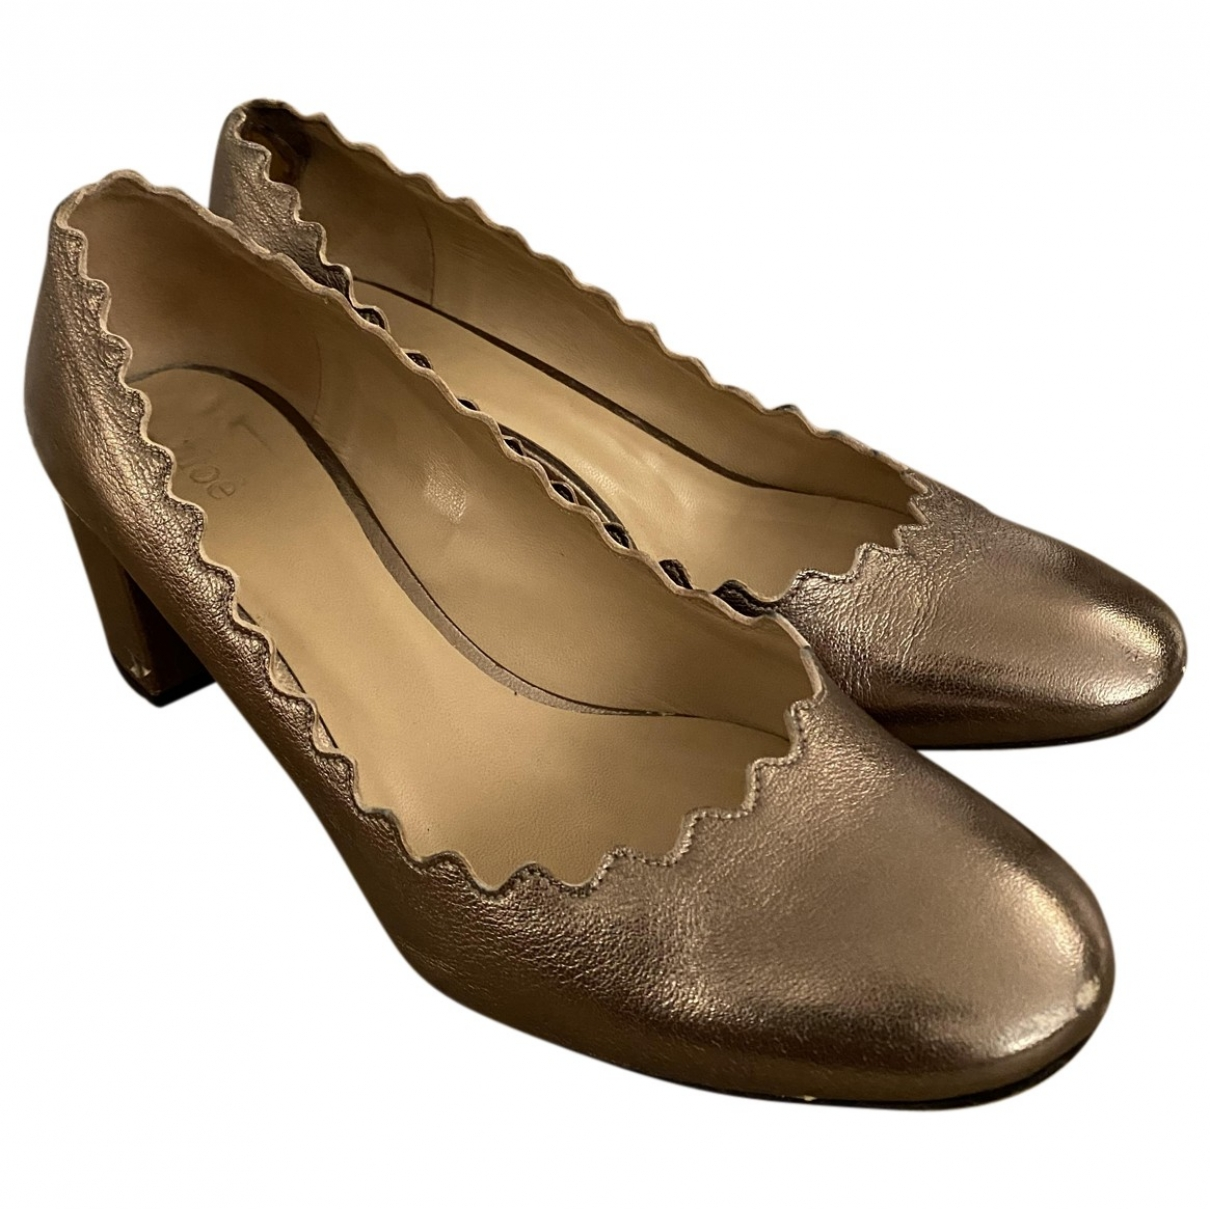 Chloé Lauren Gold Leather Heels for Women 36 EU